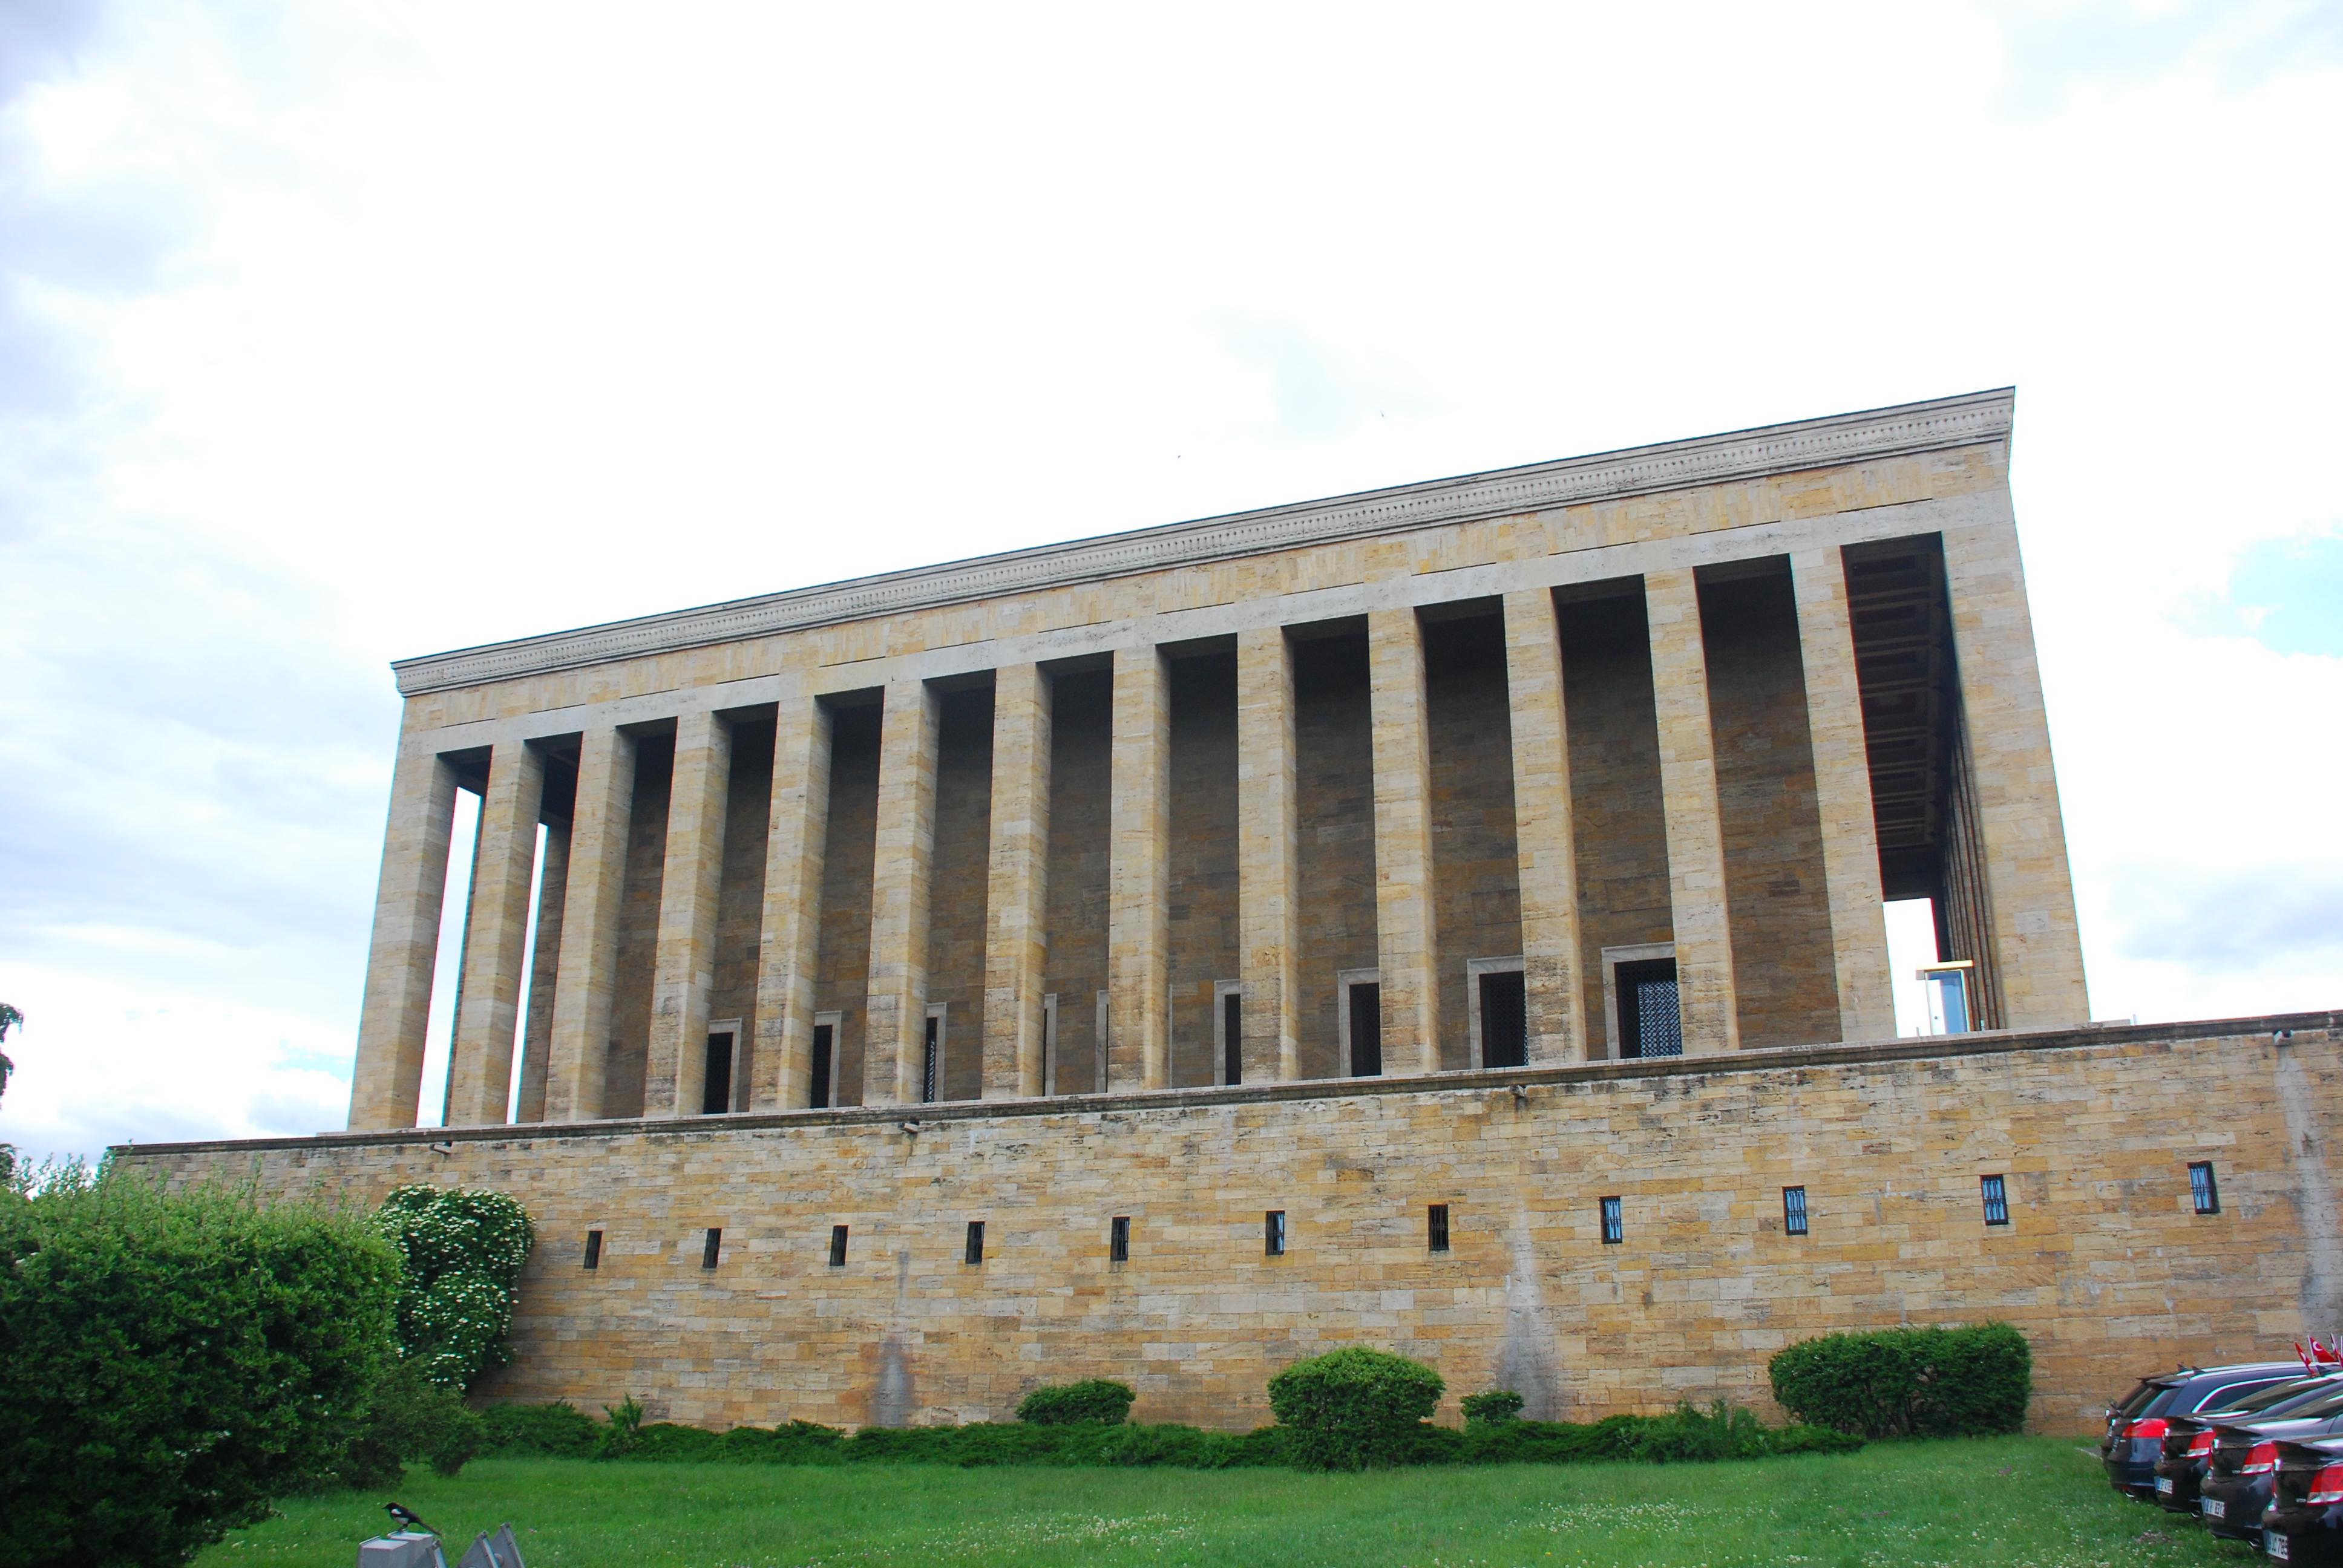 Mausoléu de Ataturk